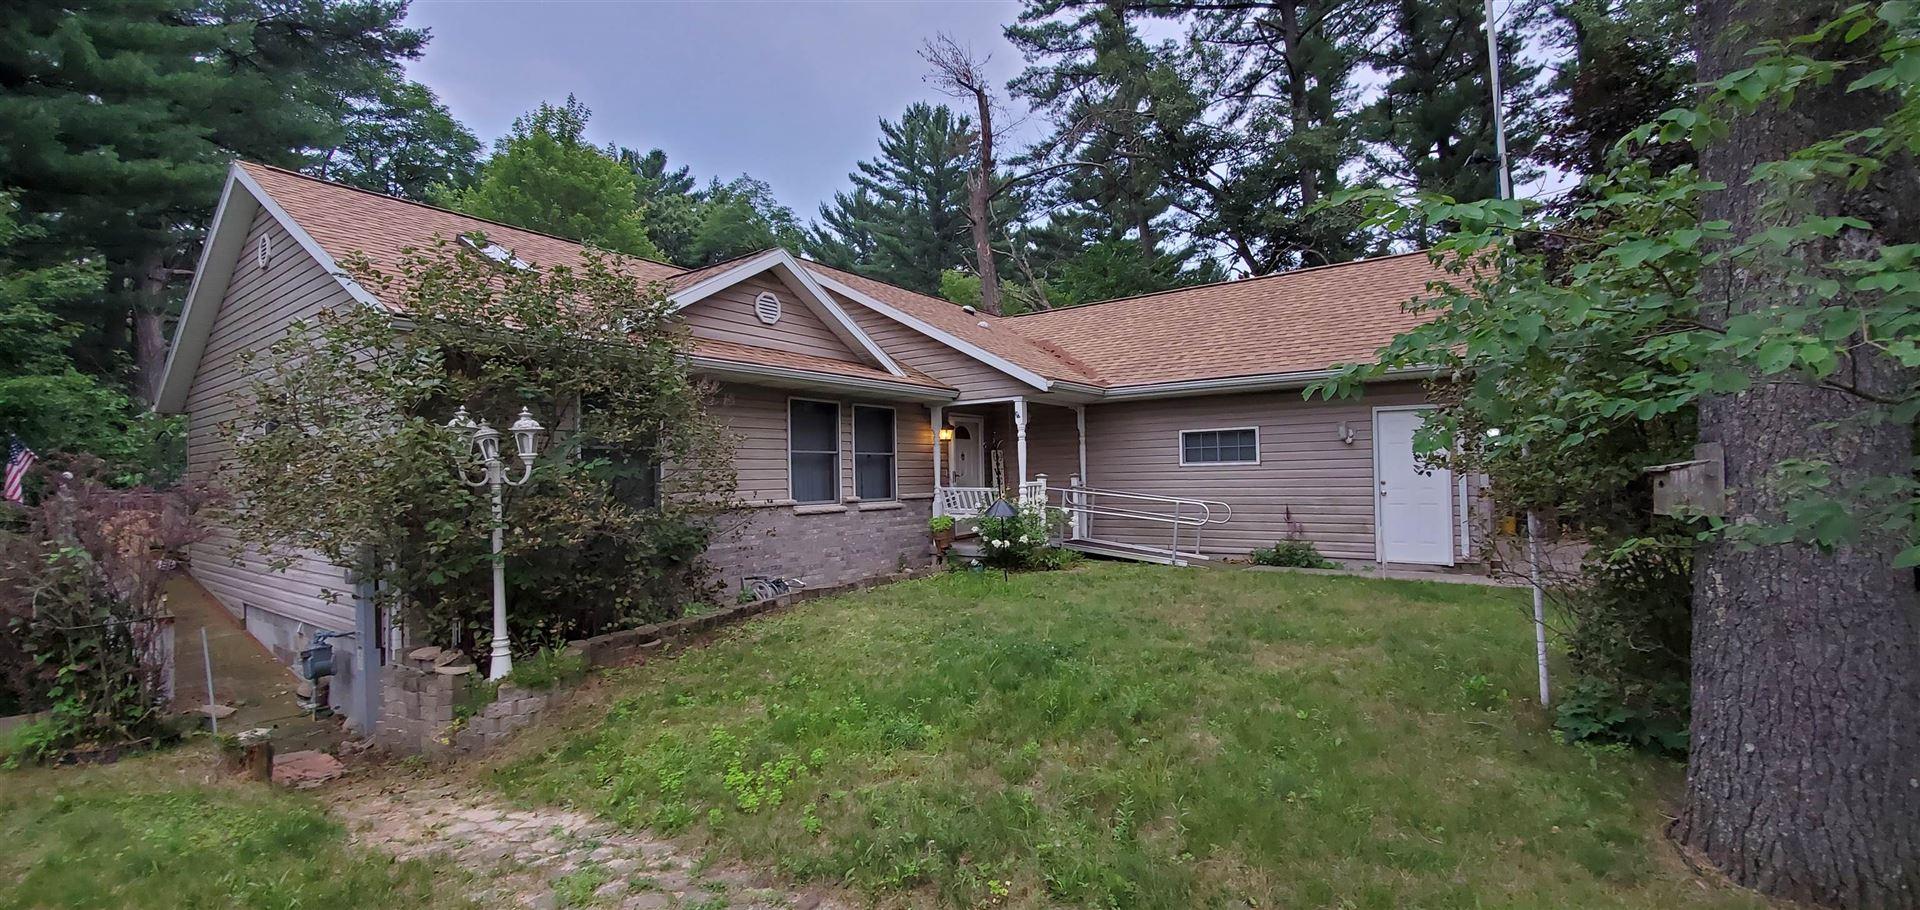 243 S Burritt Ave, Wisconsin Dells, WI 53965 - #: 1921400